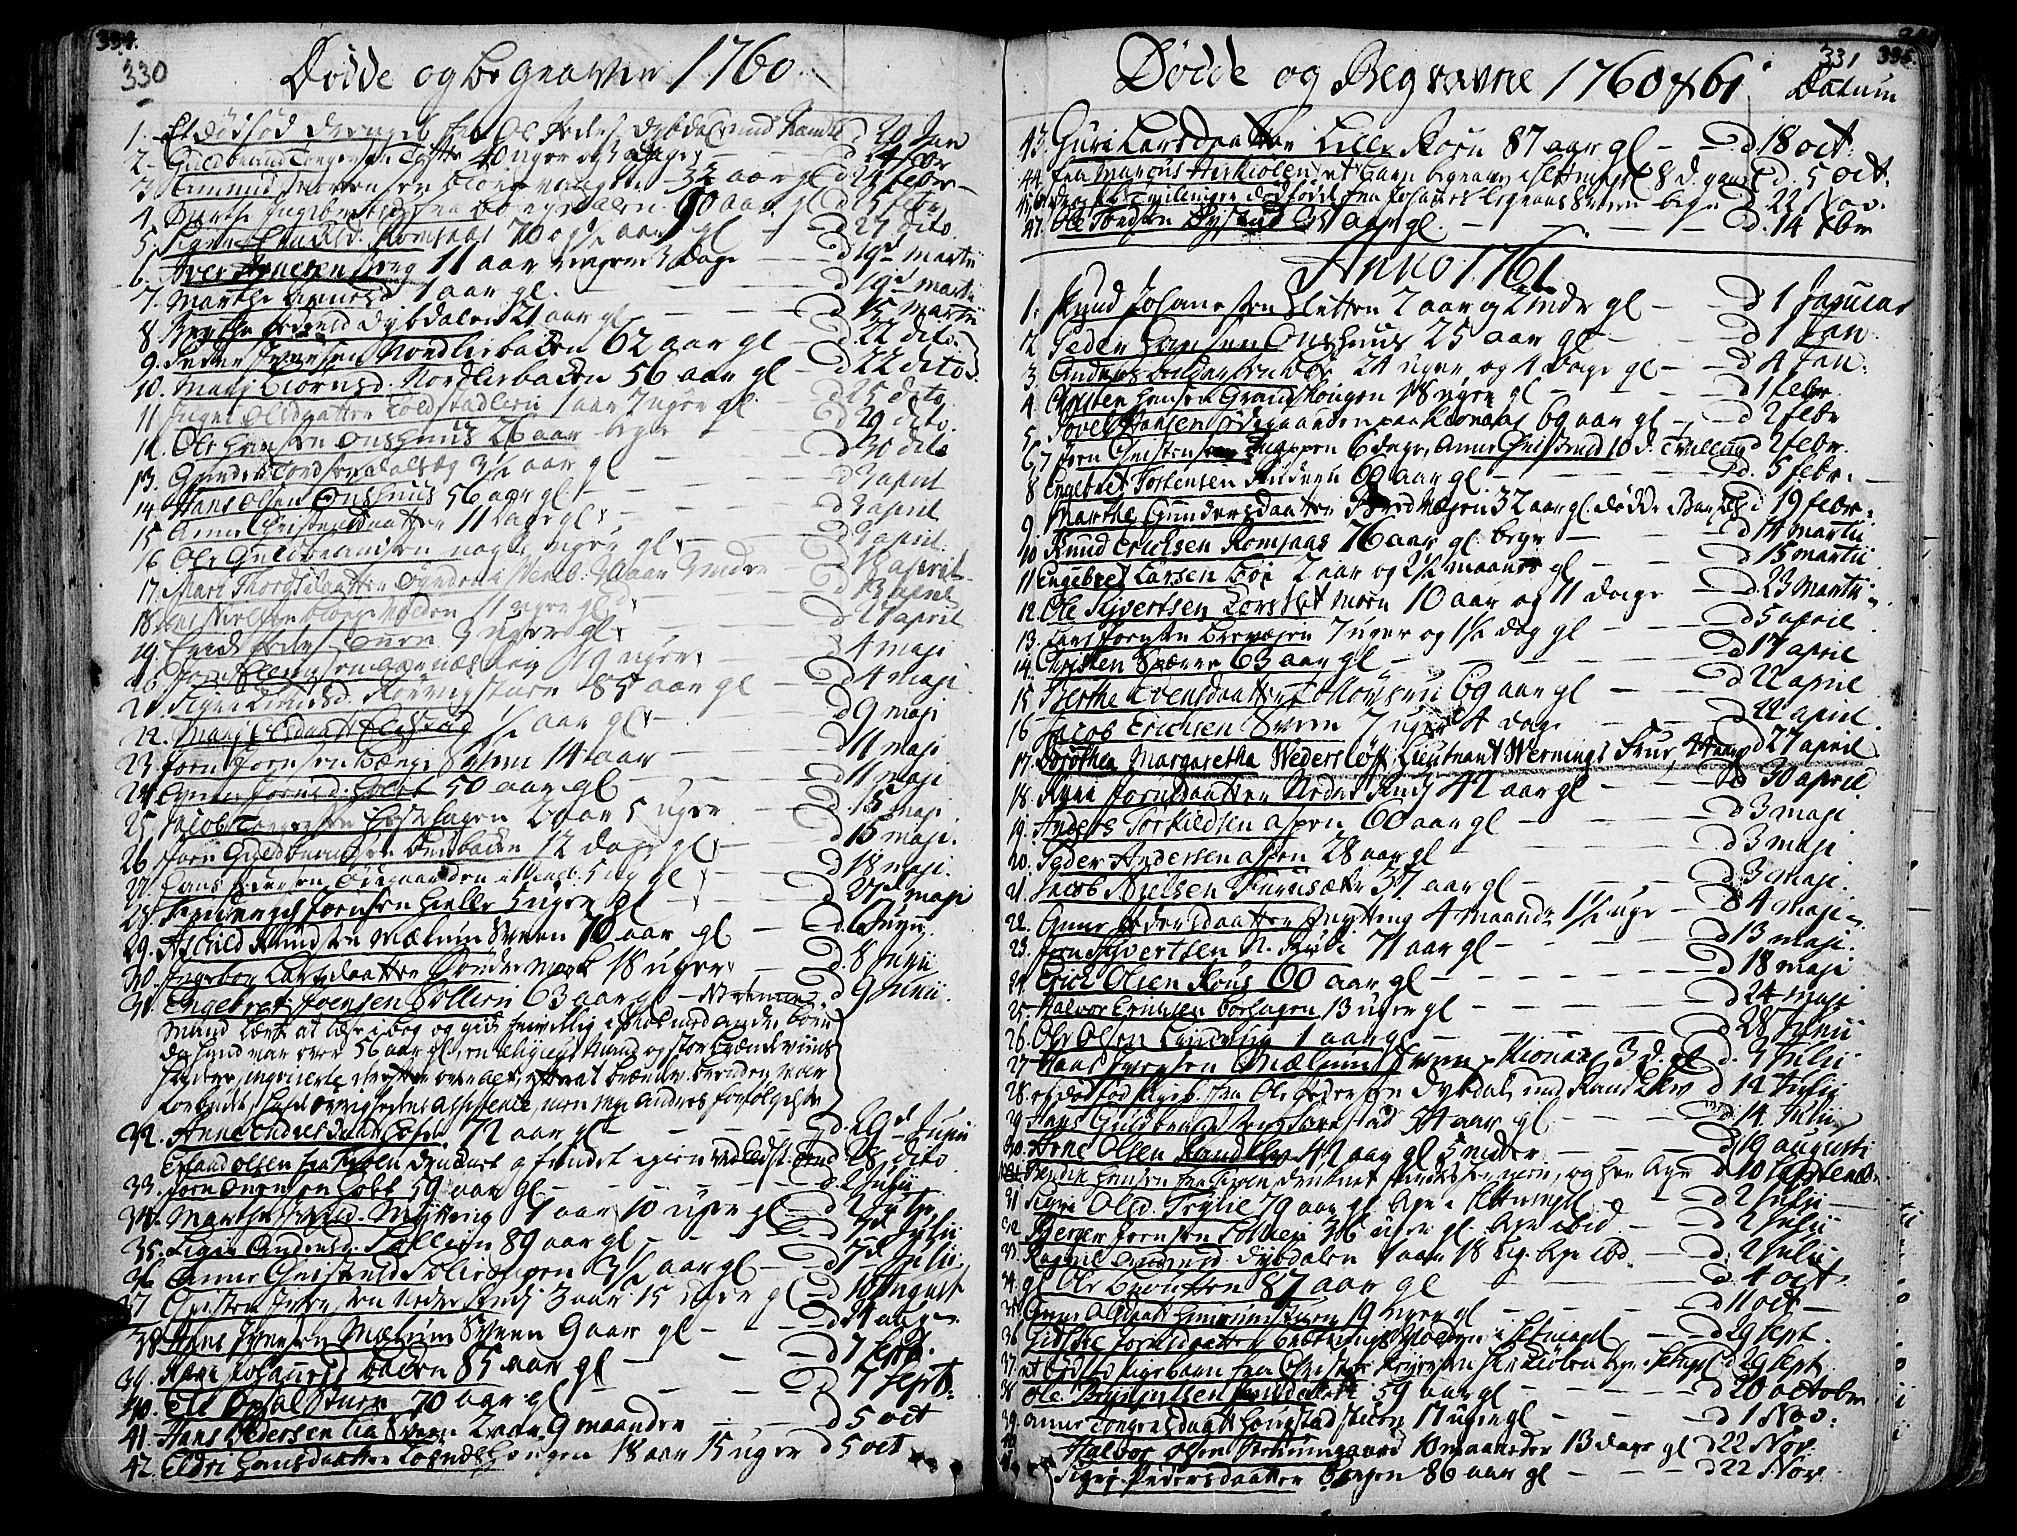 SAH, Ringebu prestekontor, Ministerialbok nr. 2, 1734-1780, s. 330-331